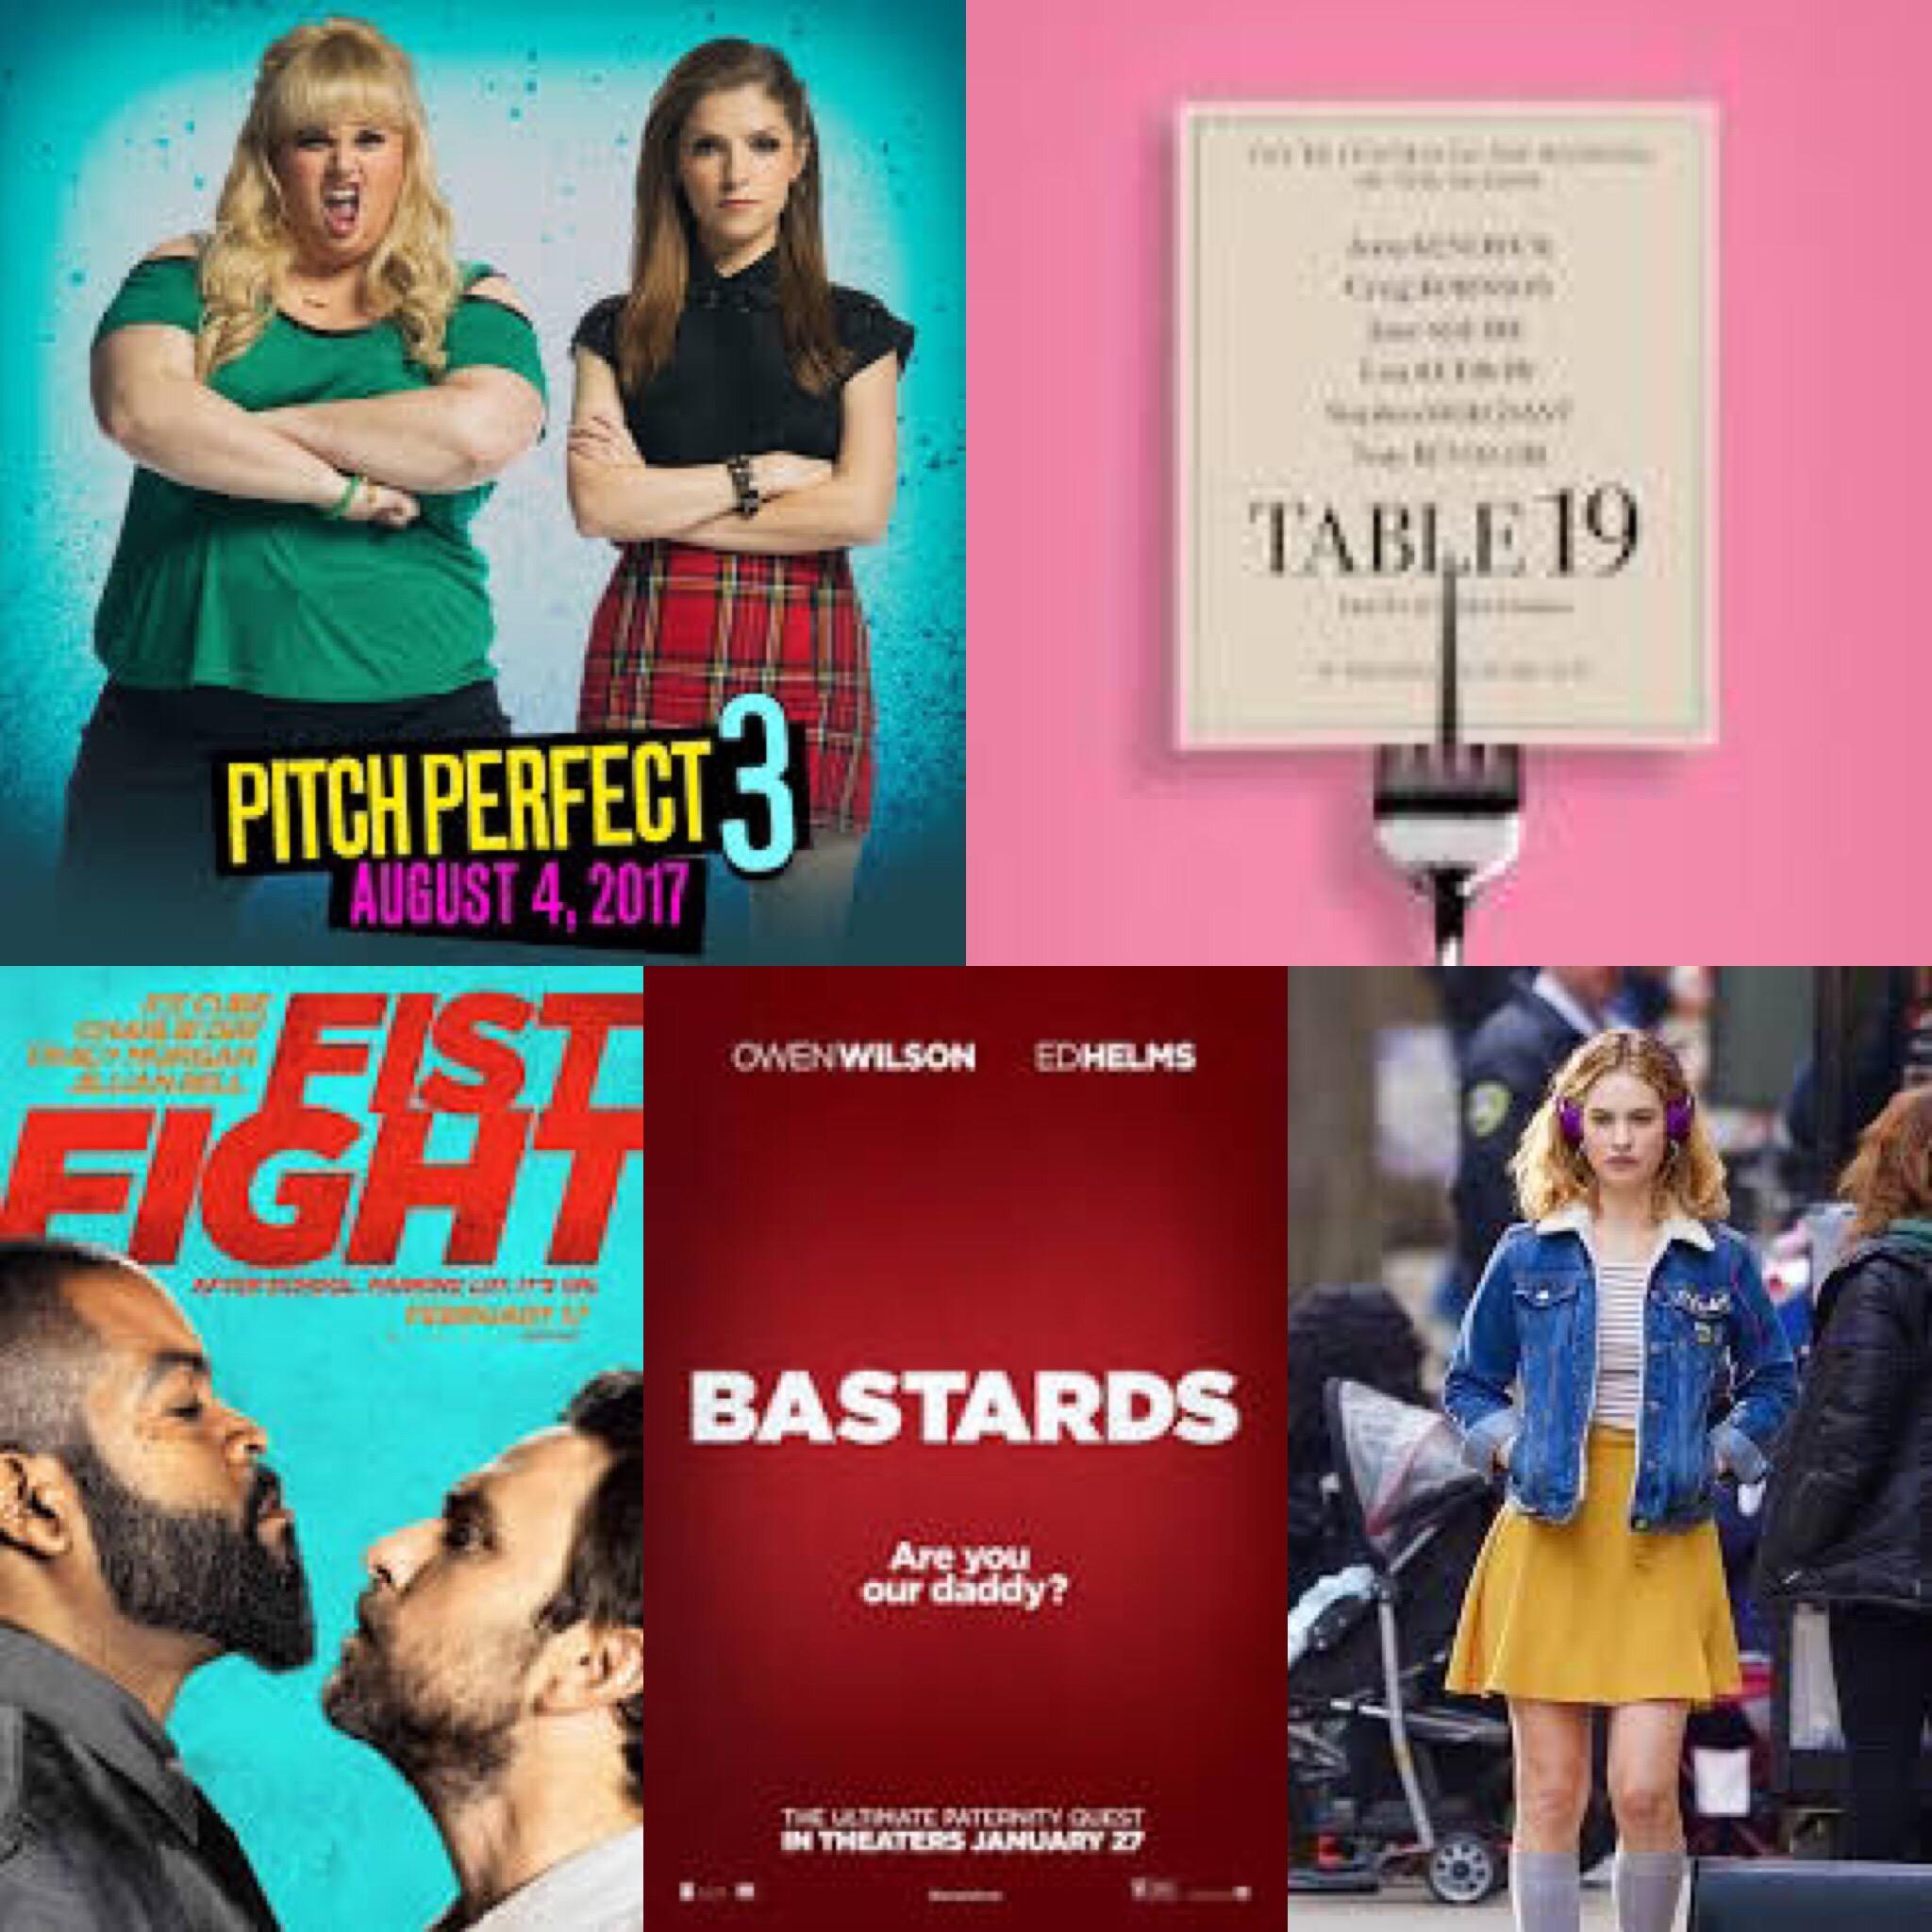 peliculas comedia 2017